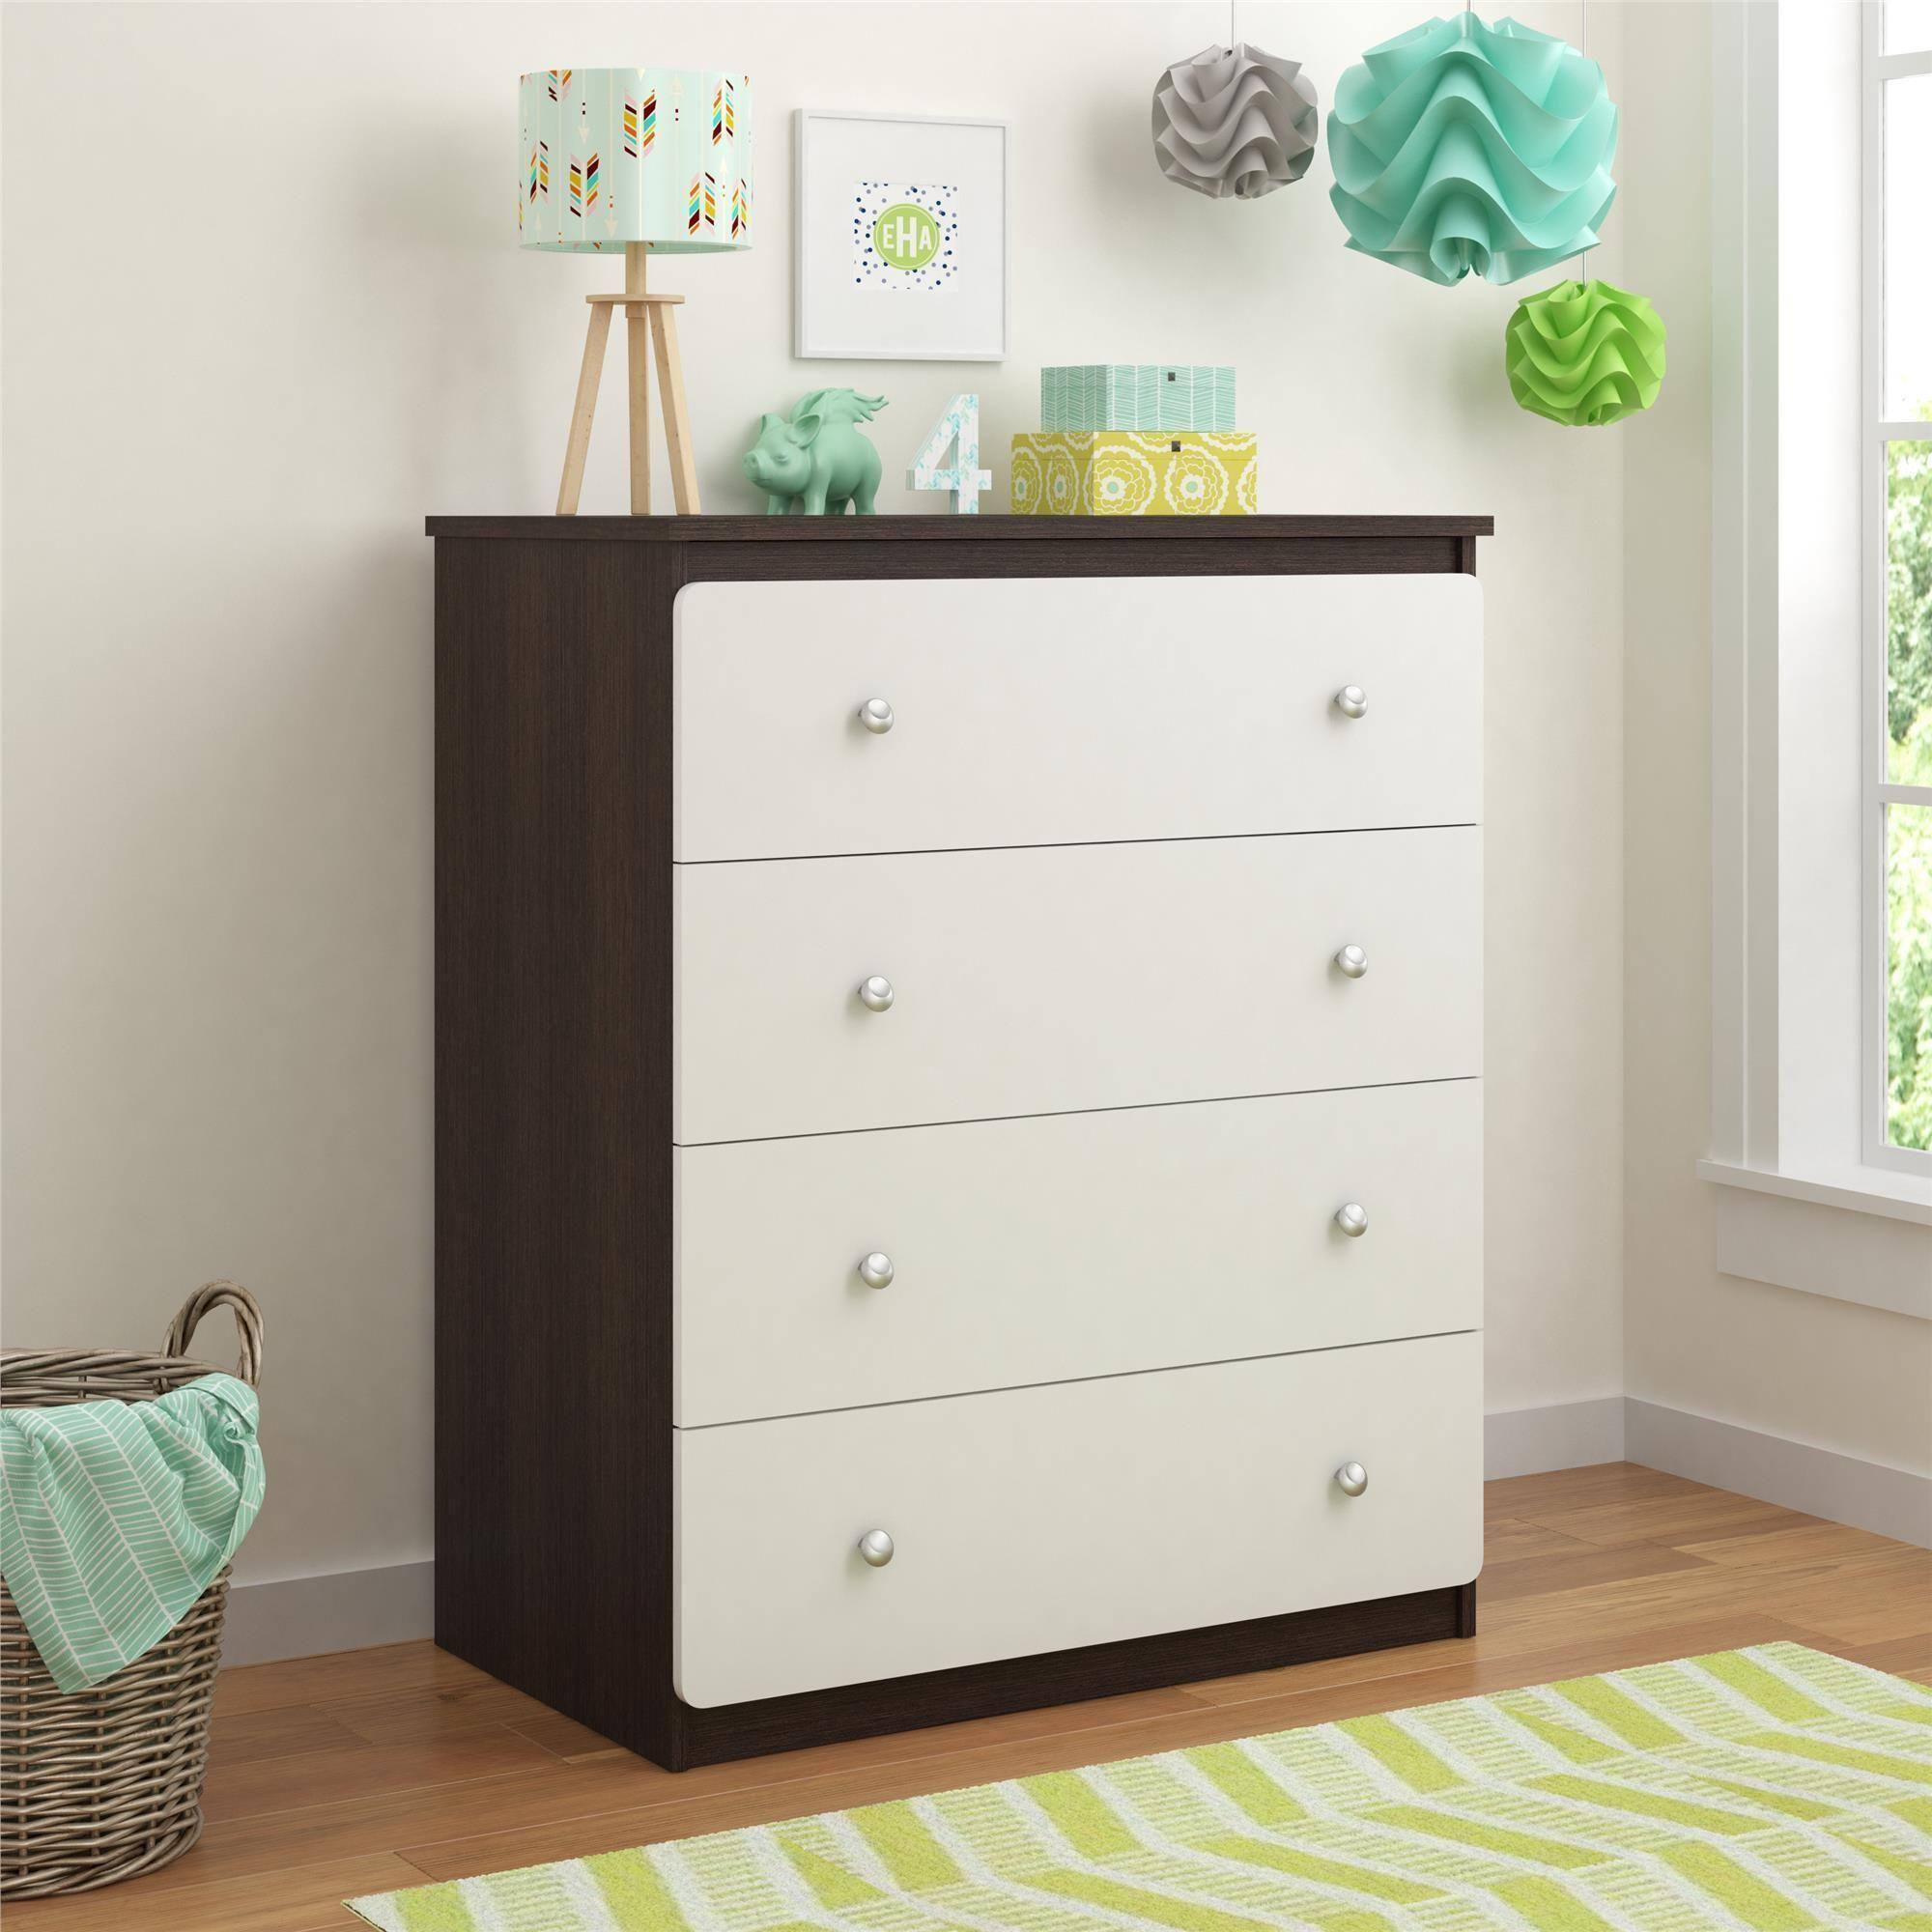 Our Best Kids Toddler Furniture Deals Storage Furniture Bedroom Kids Dressers Bedroom Chest Of Drawers [ 2000 x 2000 Pixel ]